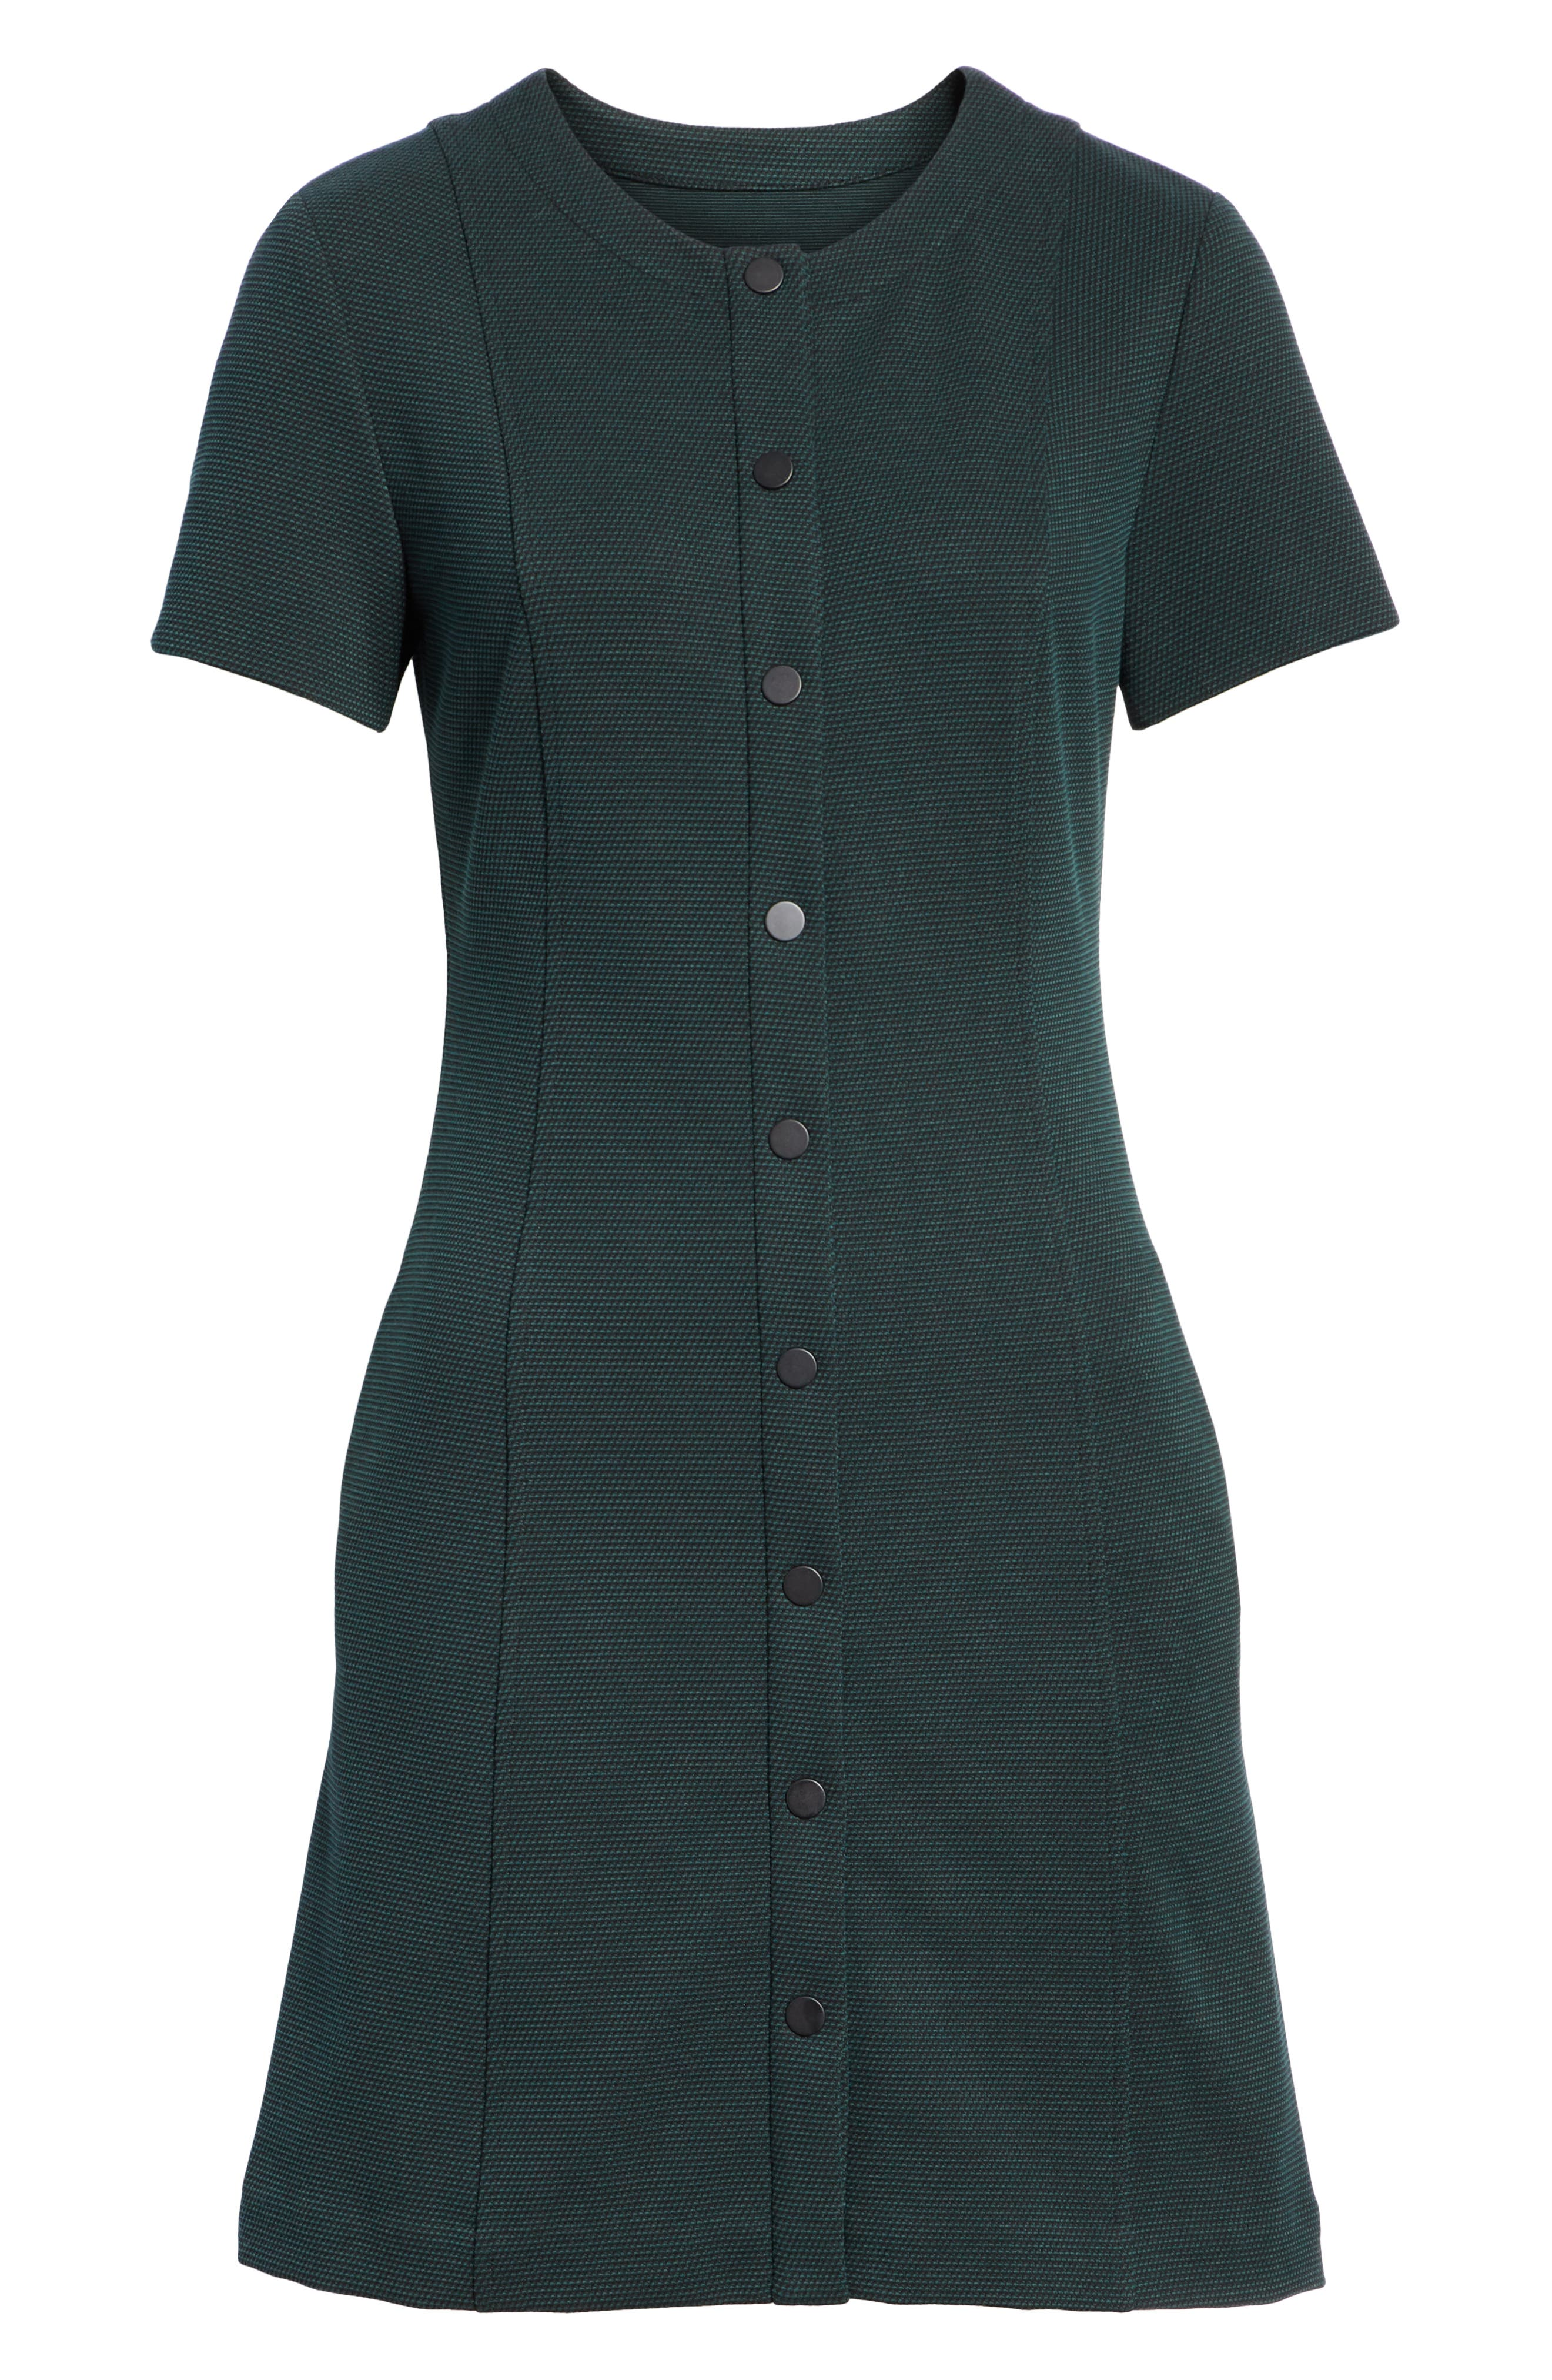 Easy Snap Textured Dress,                             Alternate thumbnail 6, color,                             GREEN POPLAR/ POP NAVY